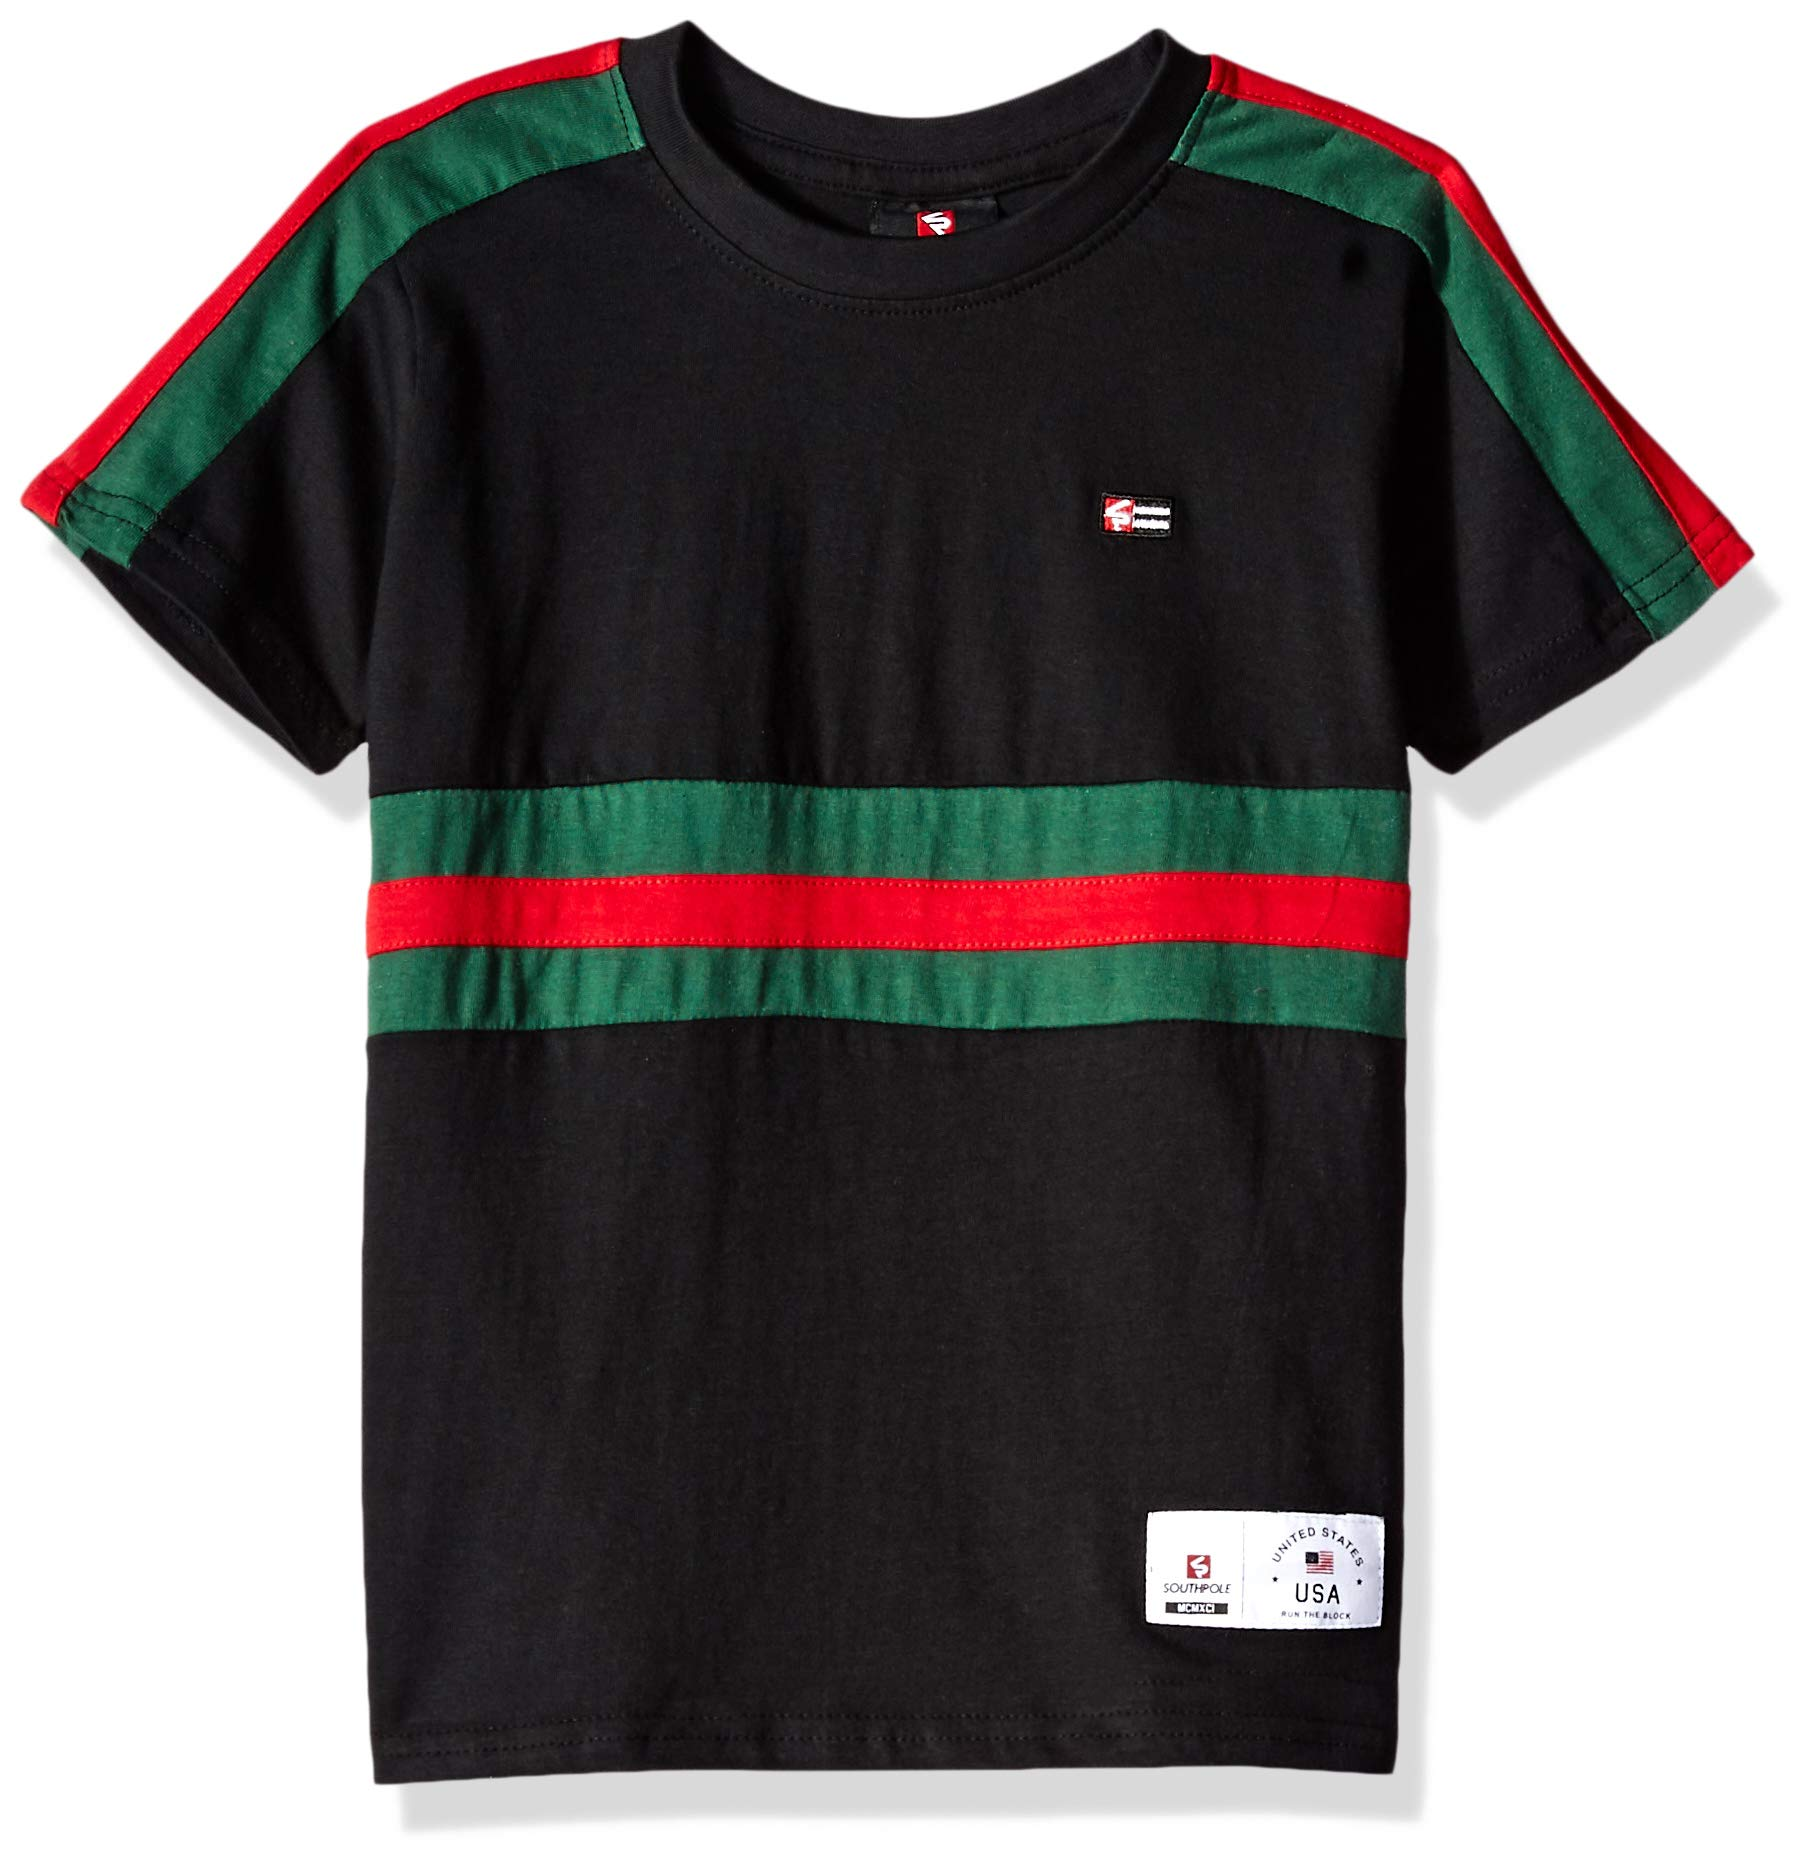 Southpole - Kids Boys' Little Colorblock Short Sleeve Fashion Tee, Black Color Stripe, Medium